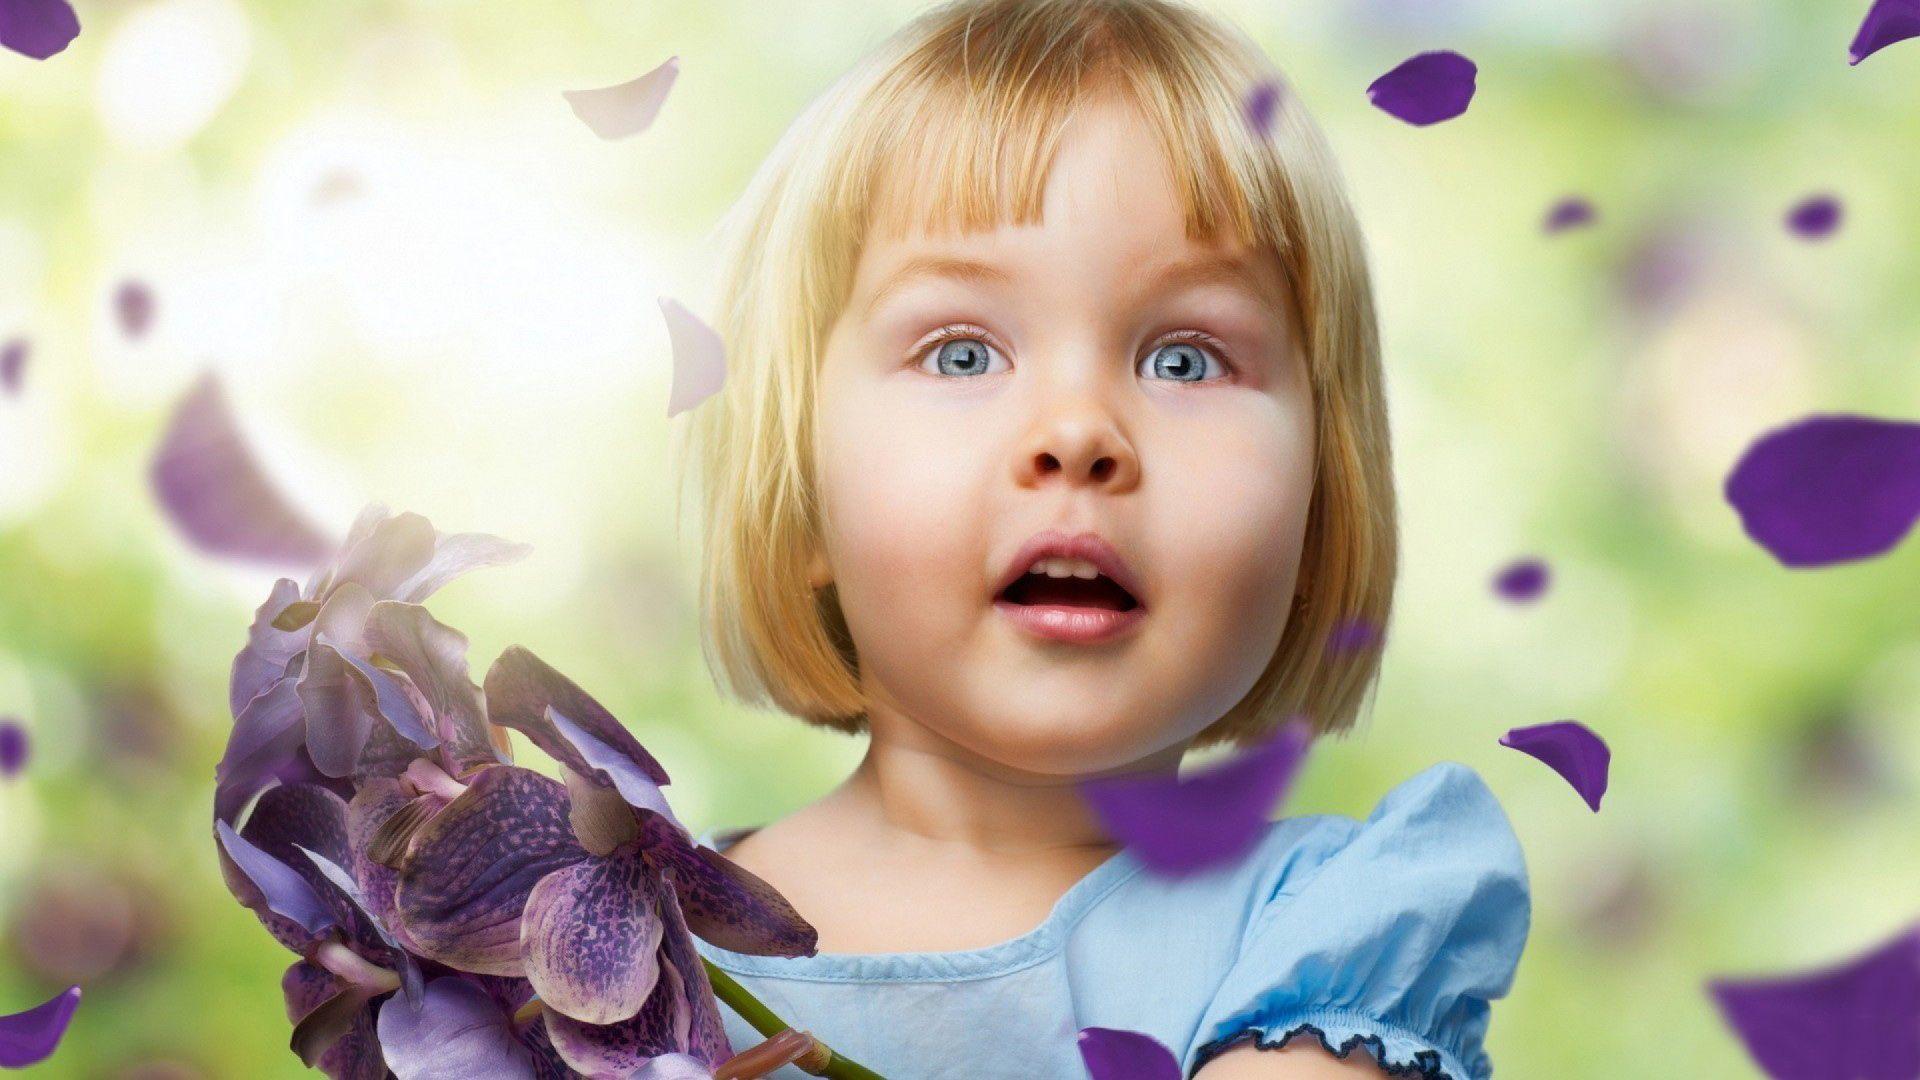 cute baby girl photos wallpapers wallpaper hd | wallpapers